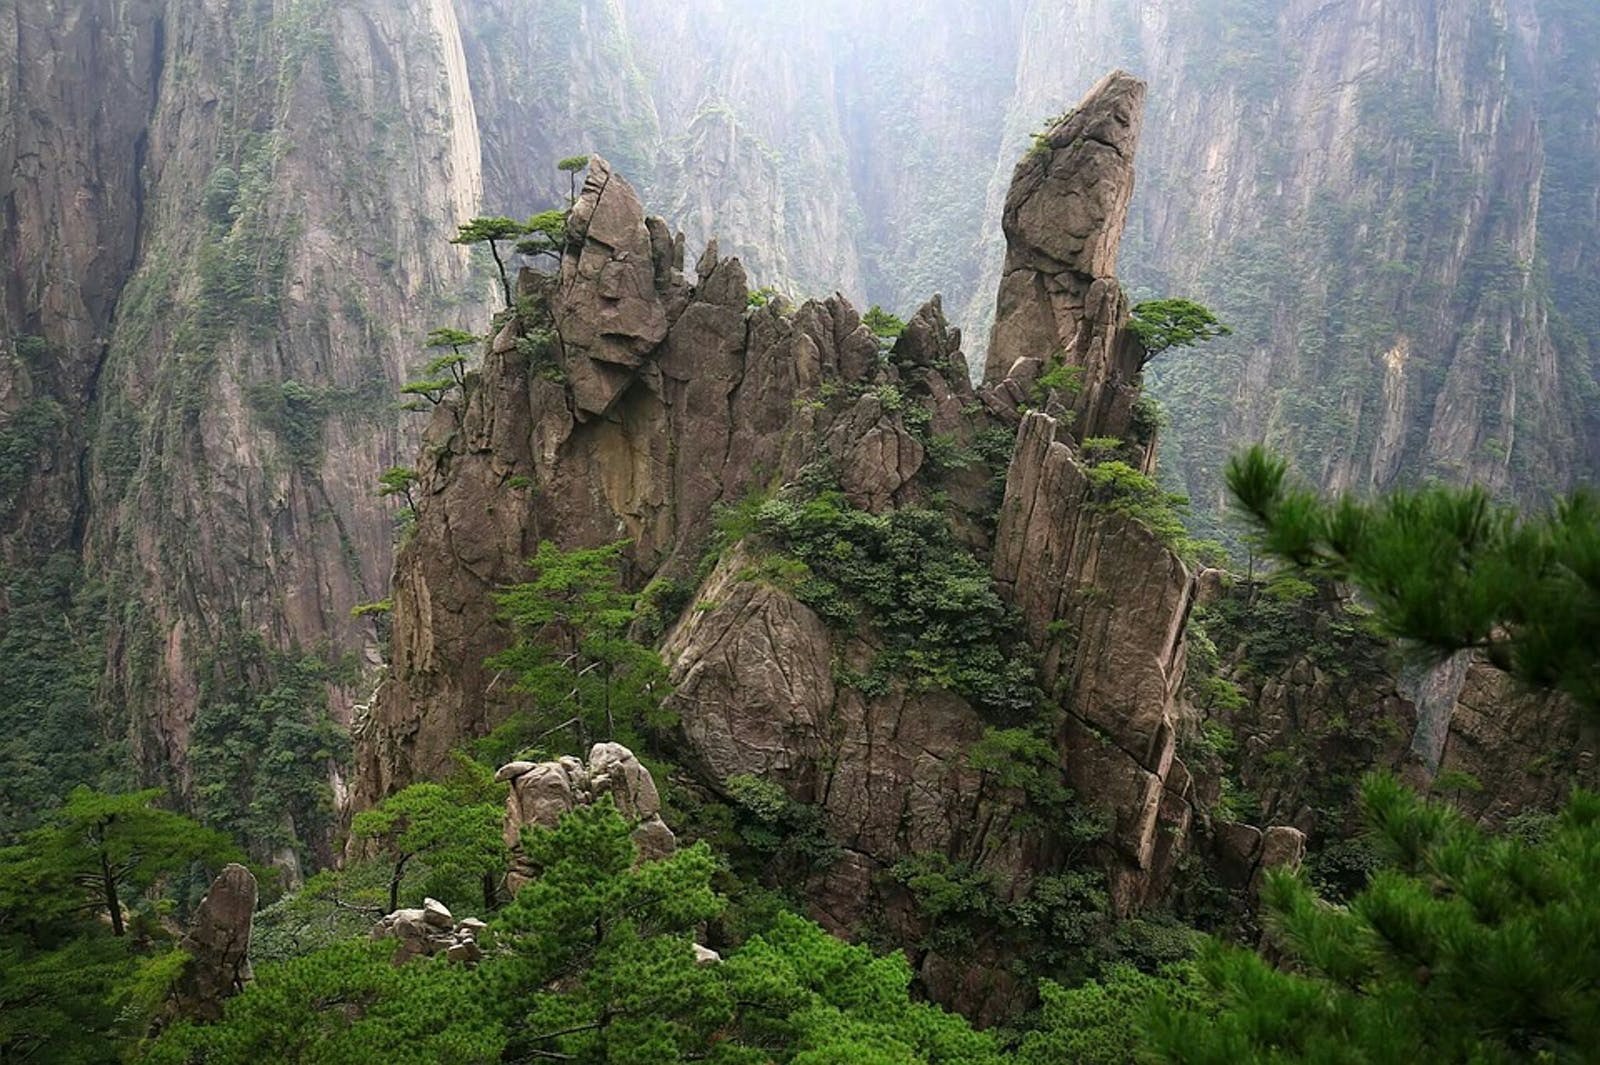 Changjiang Plain Evergreen Forests